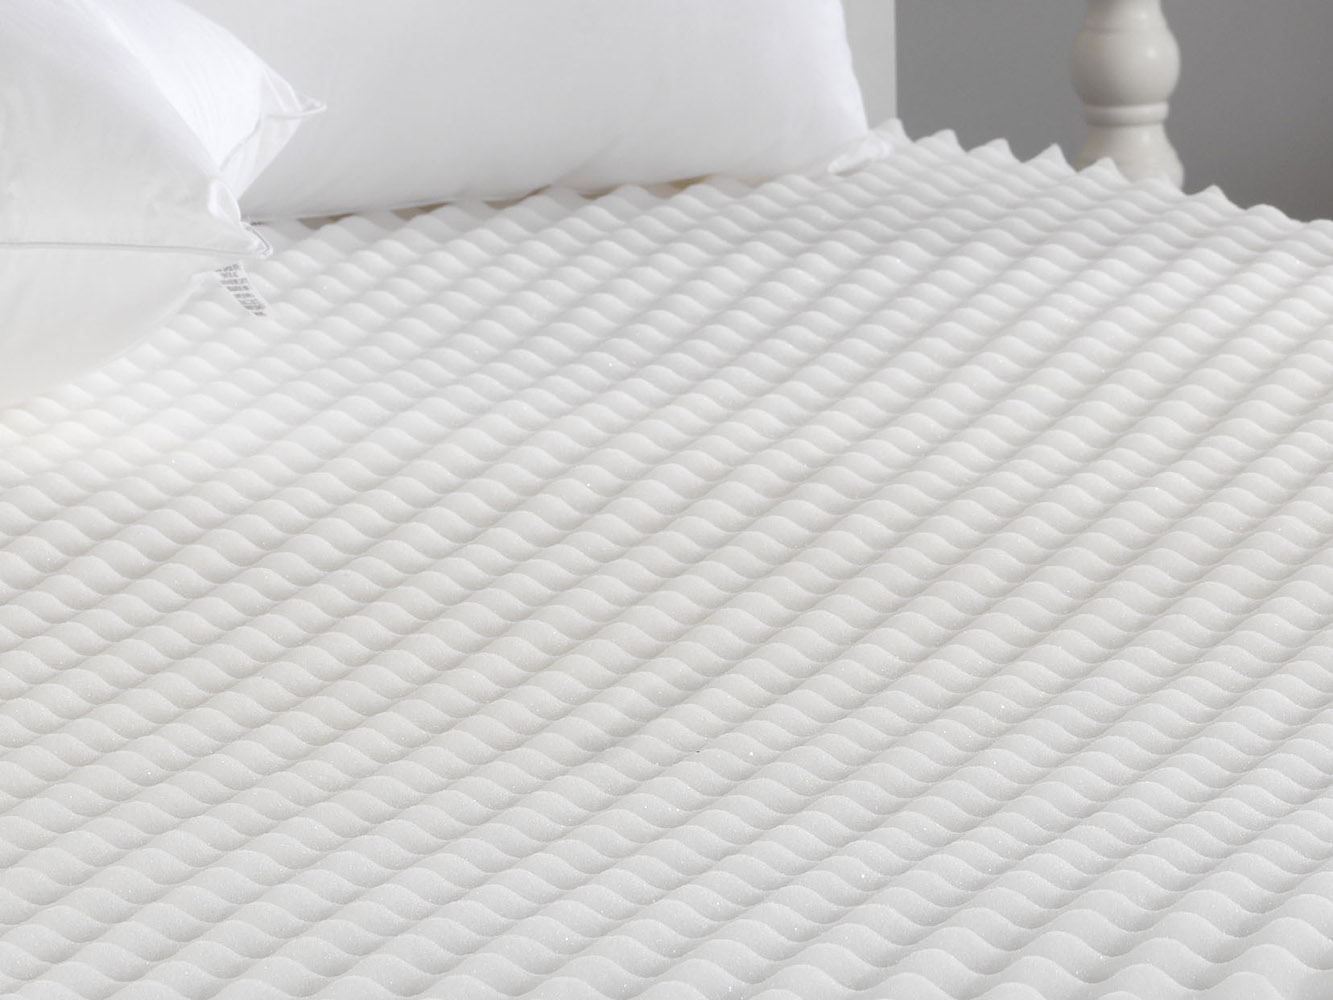 Sentinel Back Support Pain Relief Egg Box Foam Mattress Pad/ Topper -  Slight Second